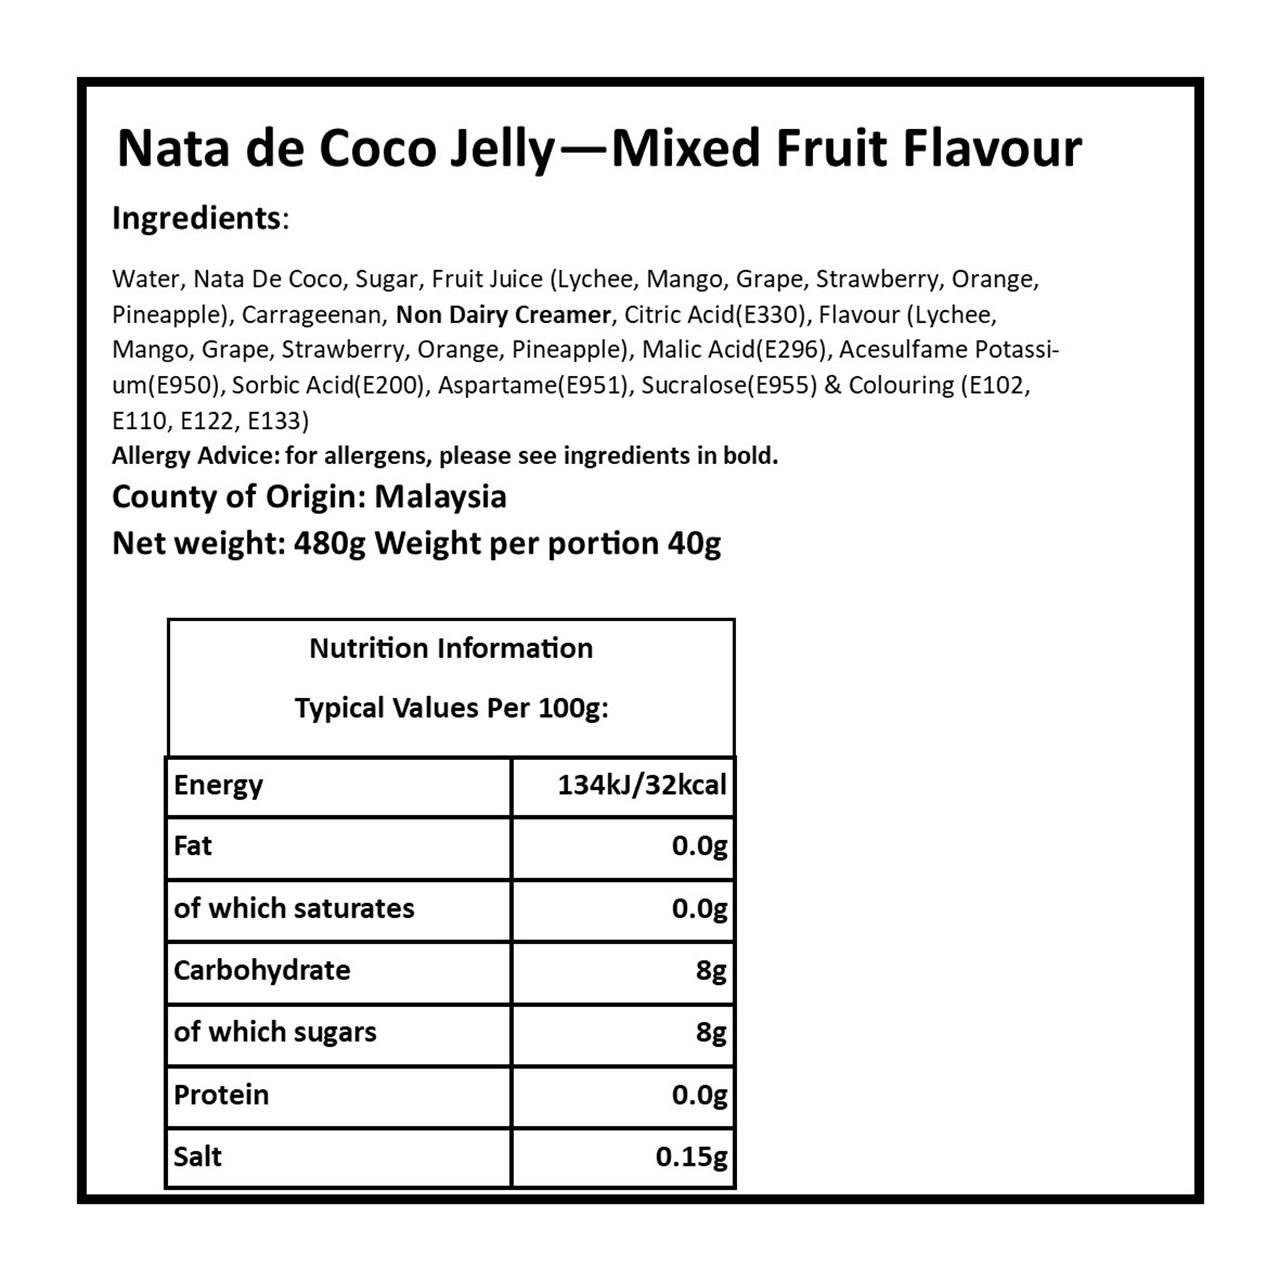 Nata De Coco Pudding: Assorted Fruit Flavour Jellies: Case Of 6 (12 Jellies Per Bag) - 2